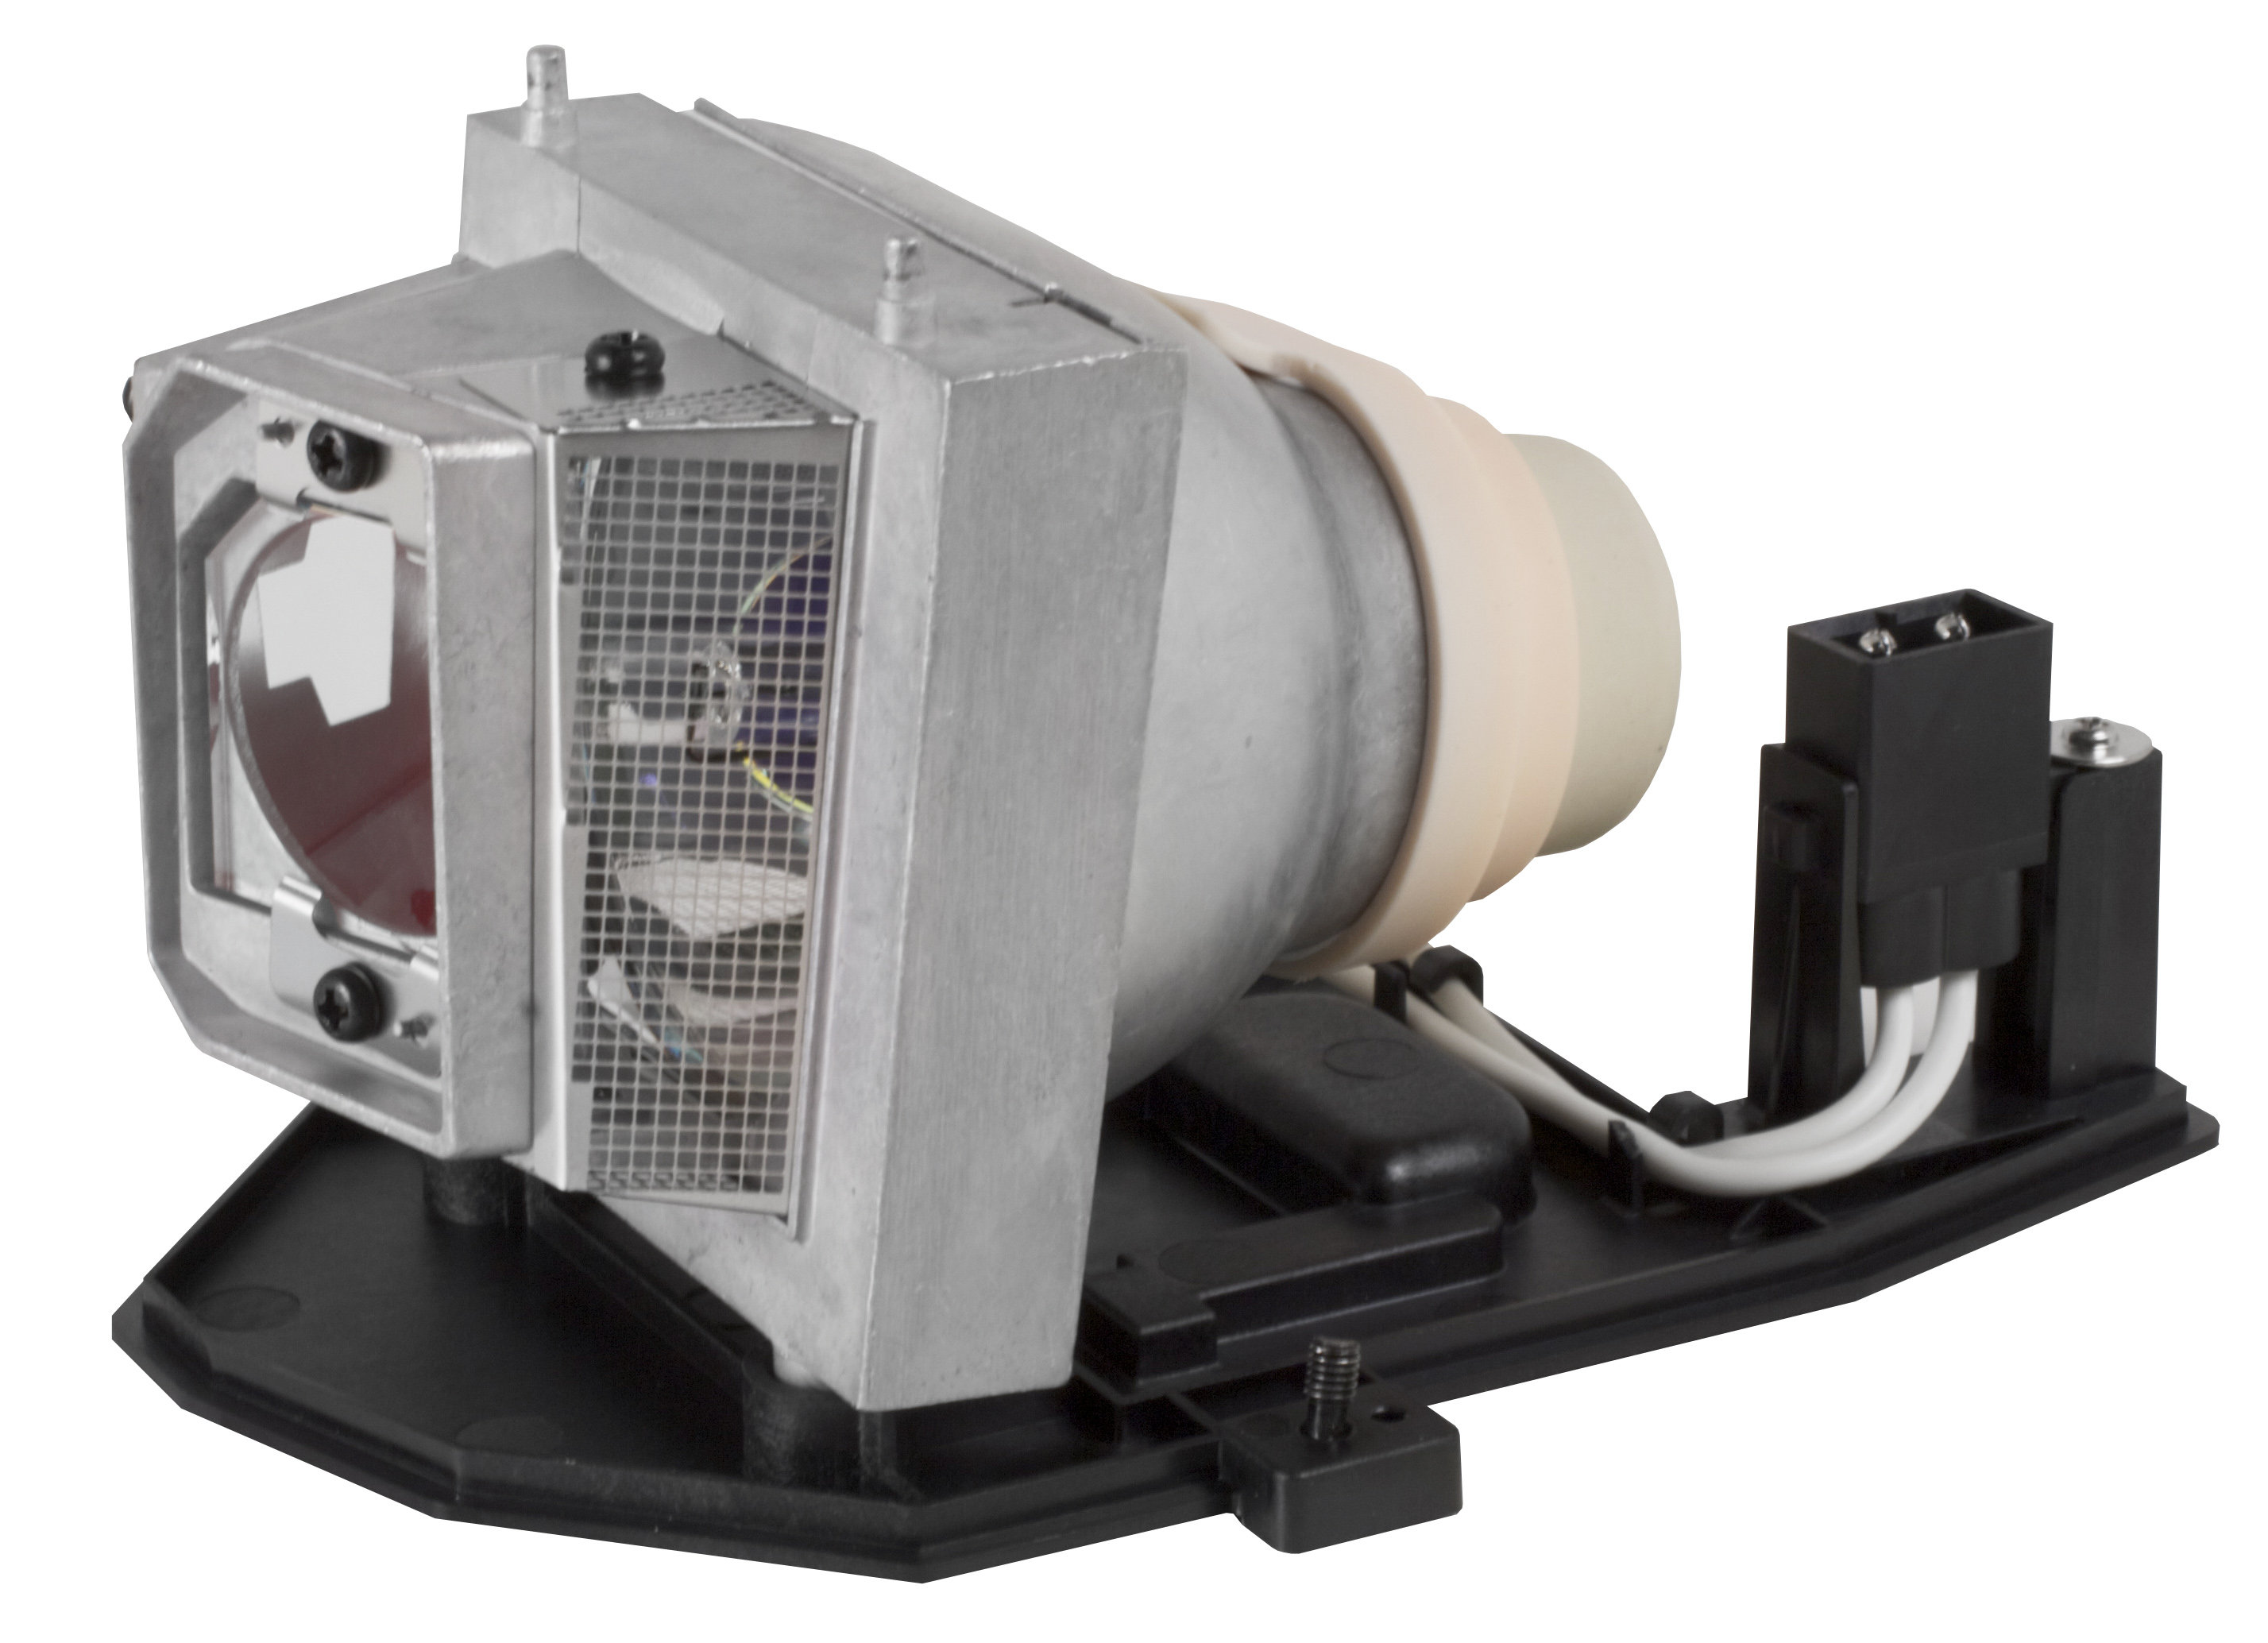 Optoma Ds339 Svga 2600 Lumen 3d Multimedia Projector